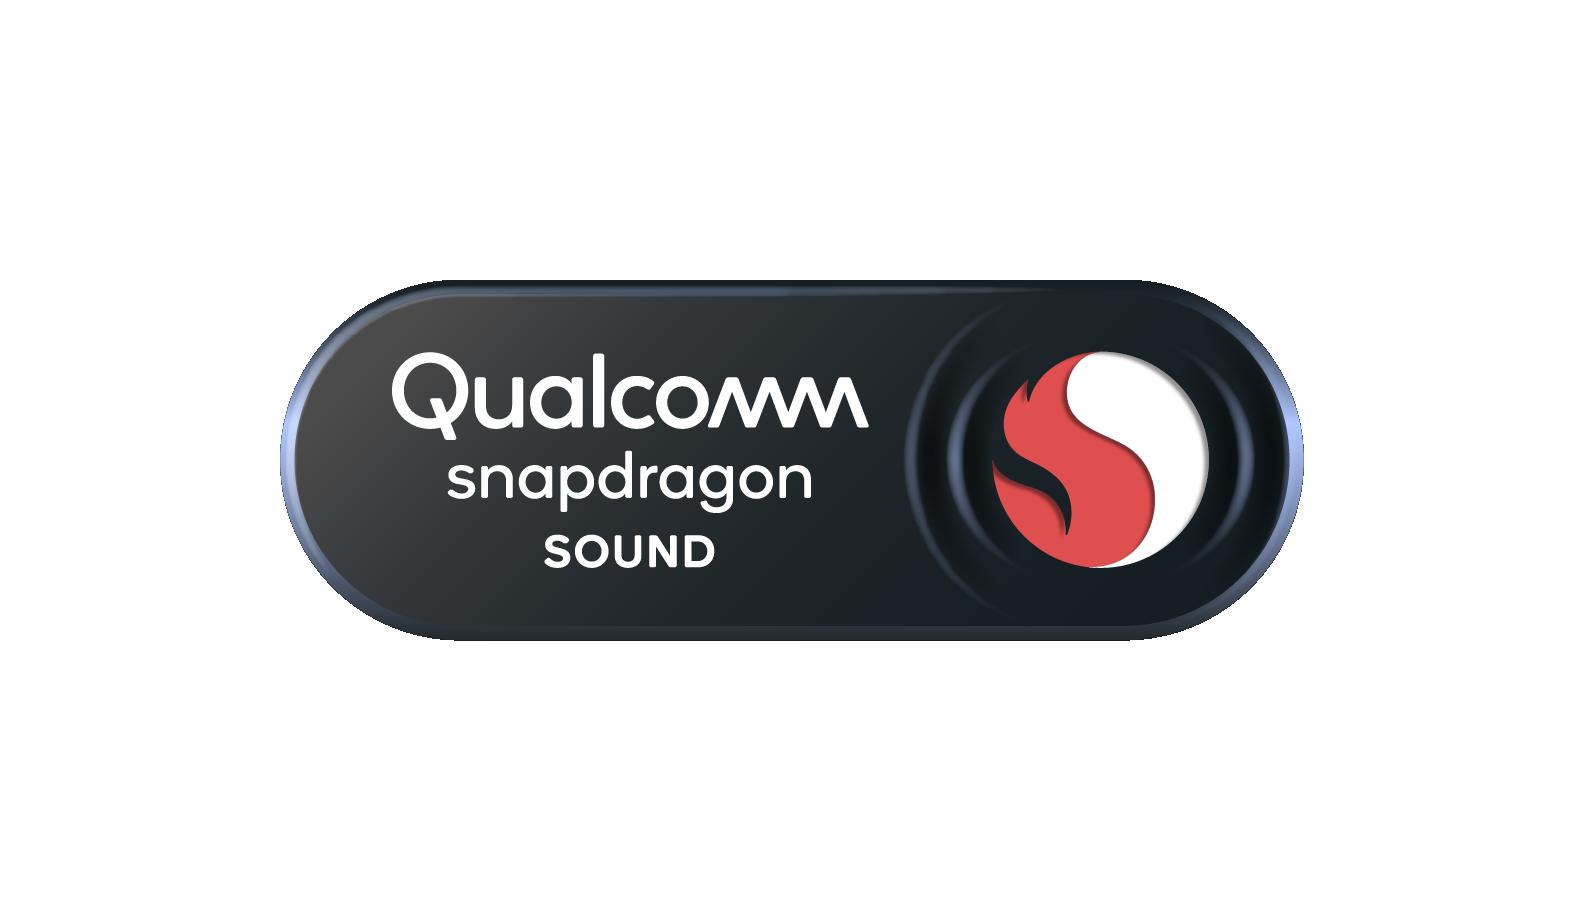 Qualcomm Snapdragon Sound -logo.